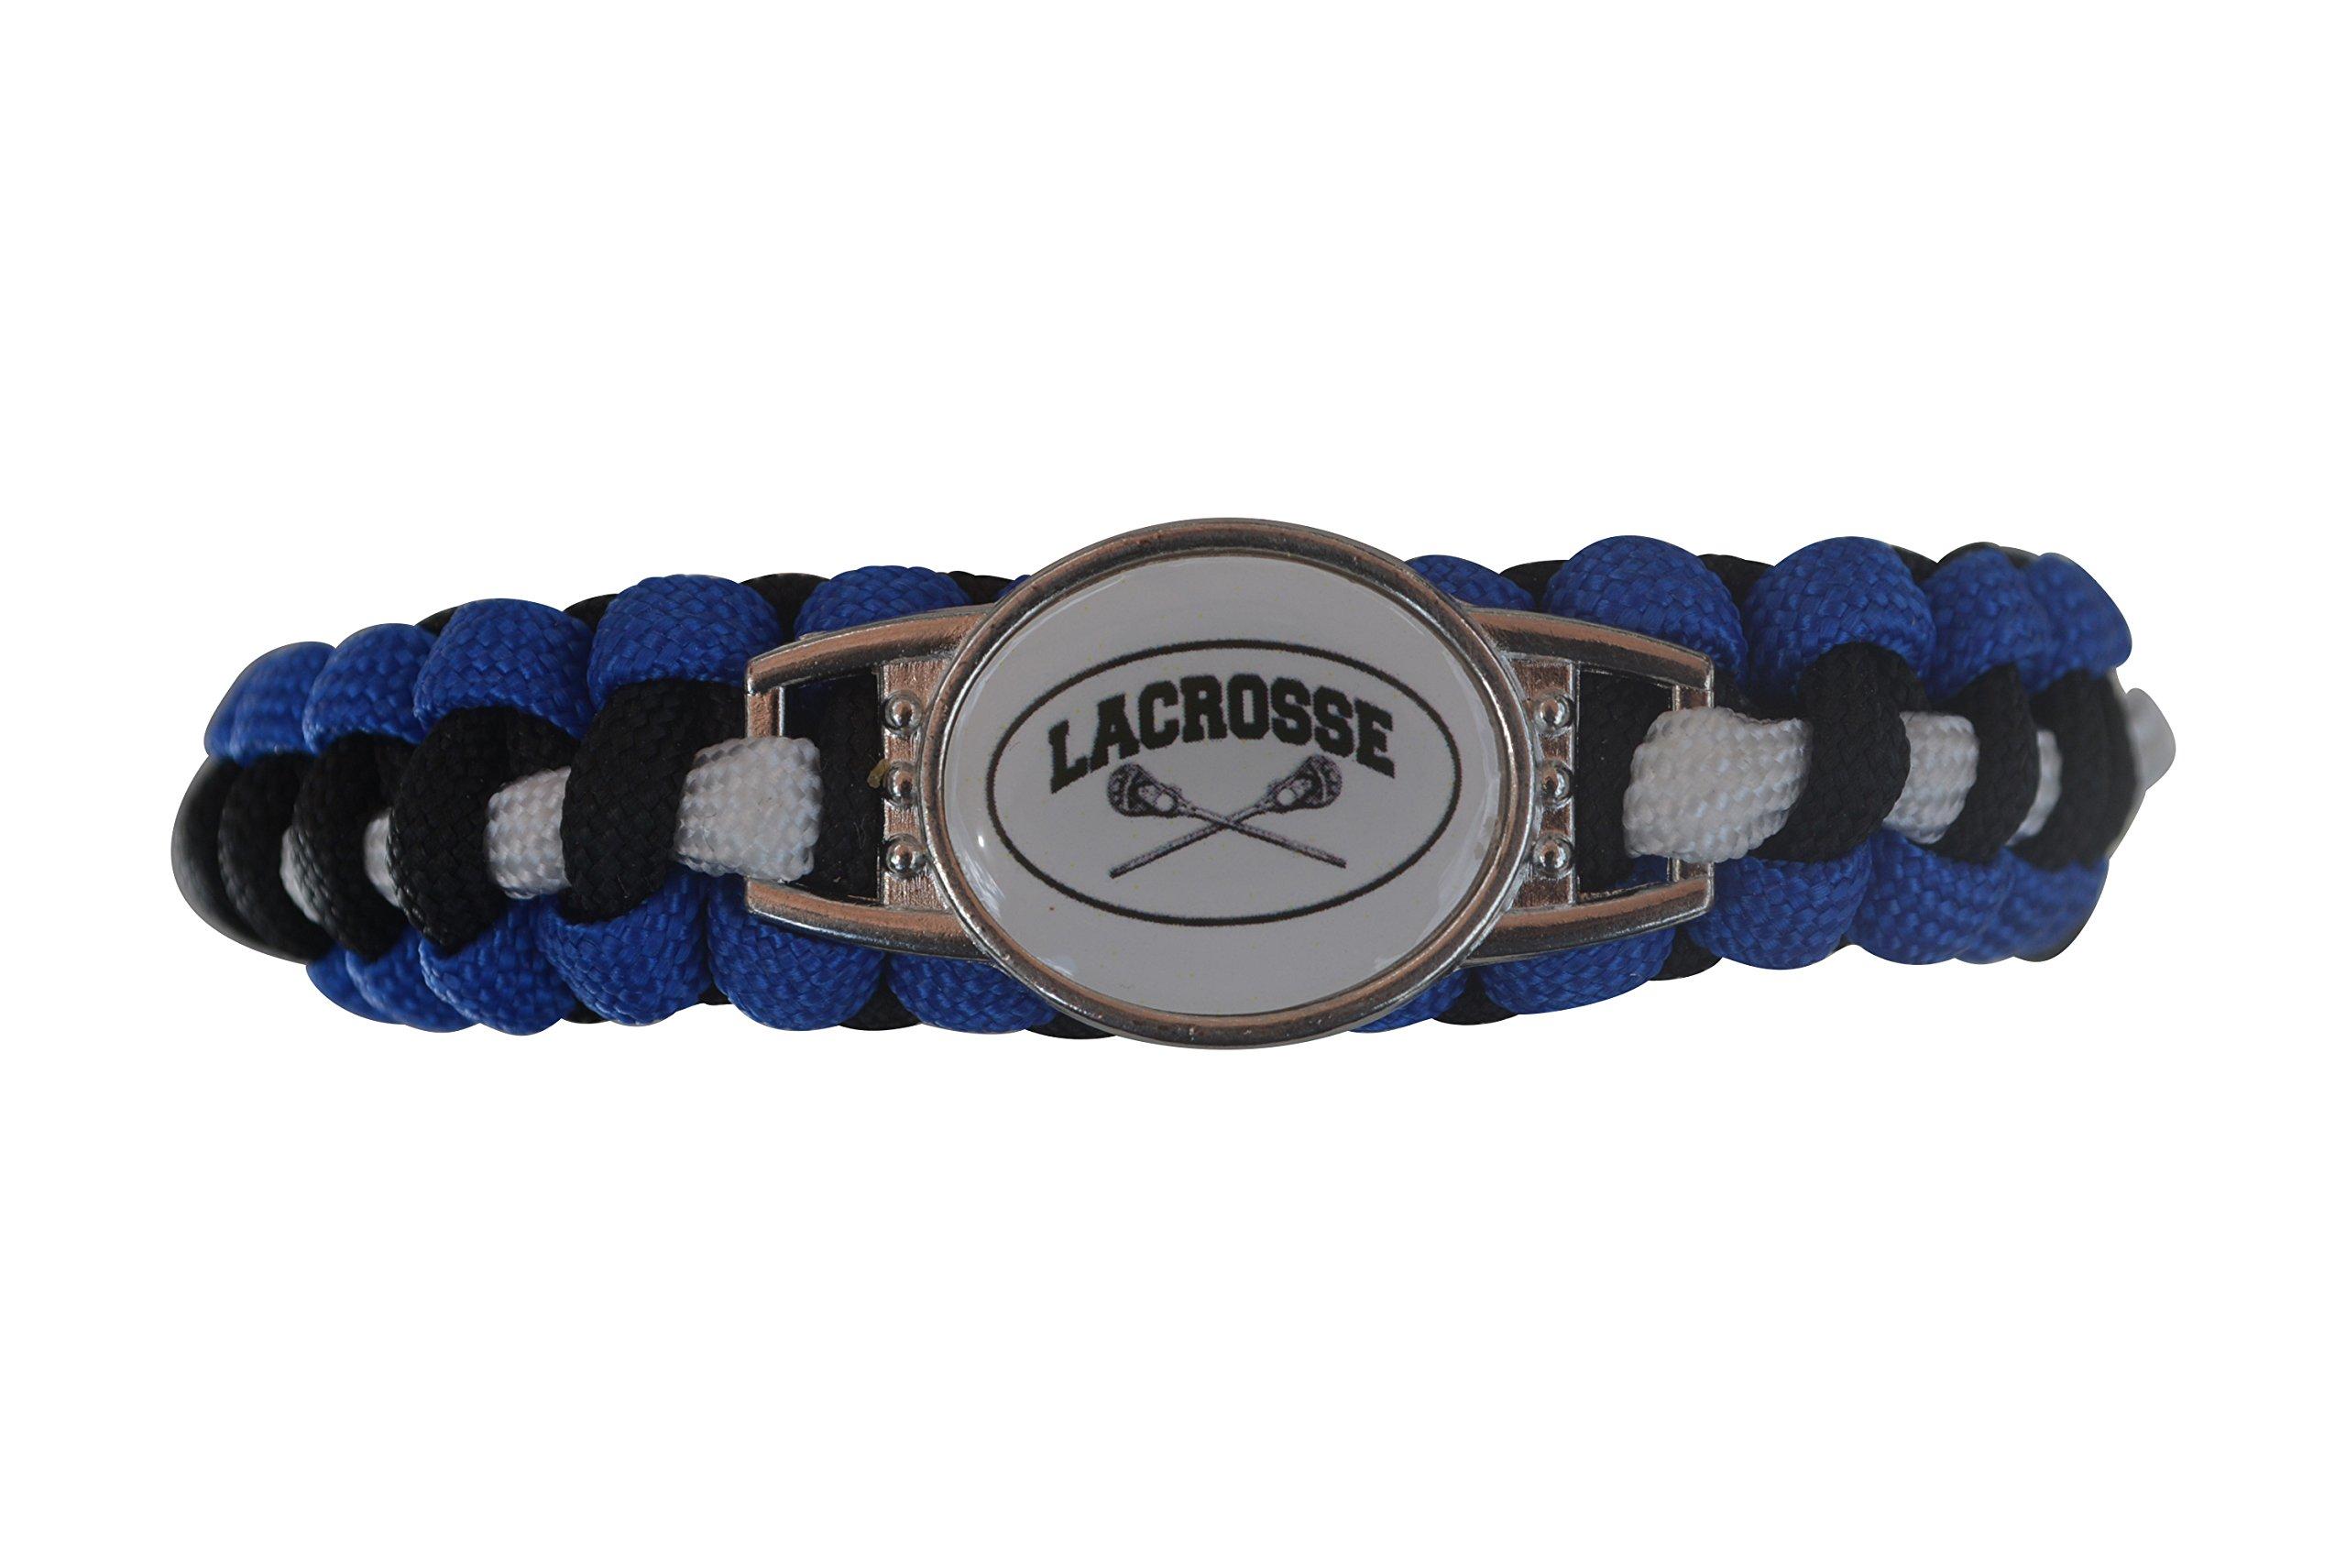 Infinity Collection Lacrosse Paracord Bracelet- Unisex Lacrosse Bracelet- Lacrosse Jewelry For Lacrosse Players by Infinity Collection (Image #1)